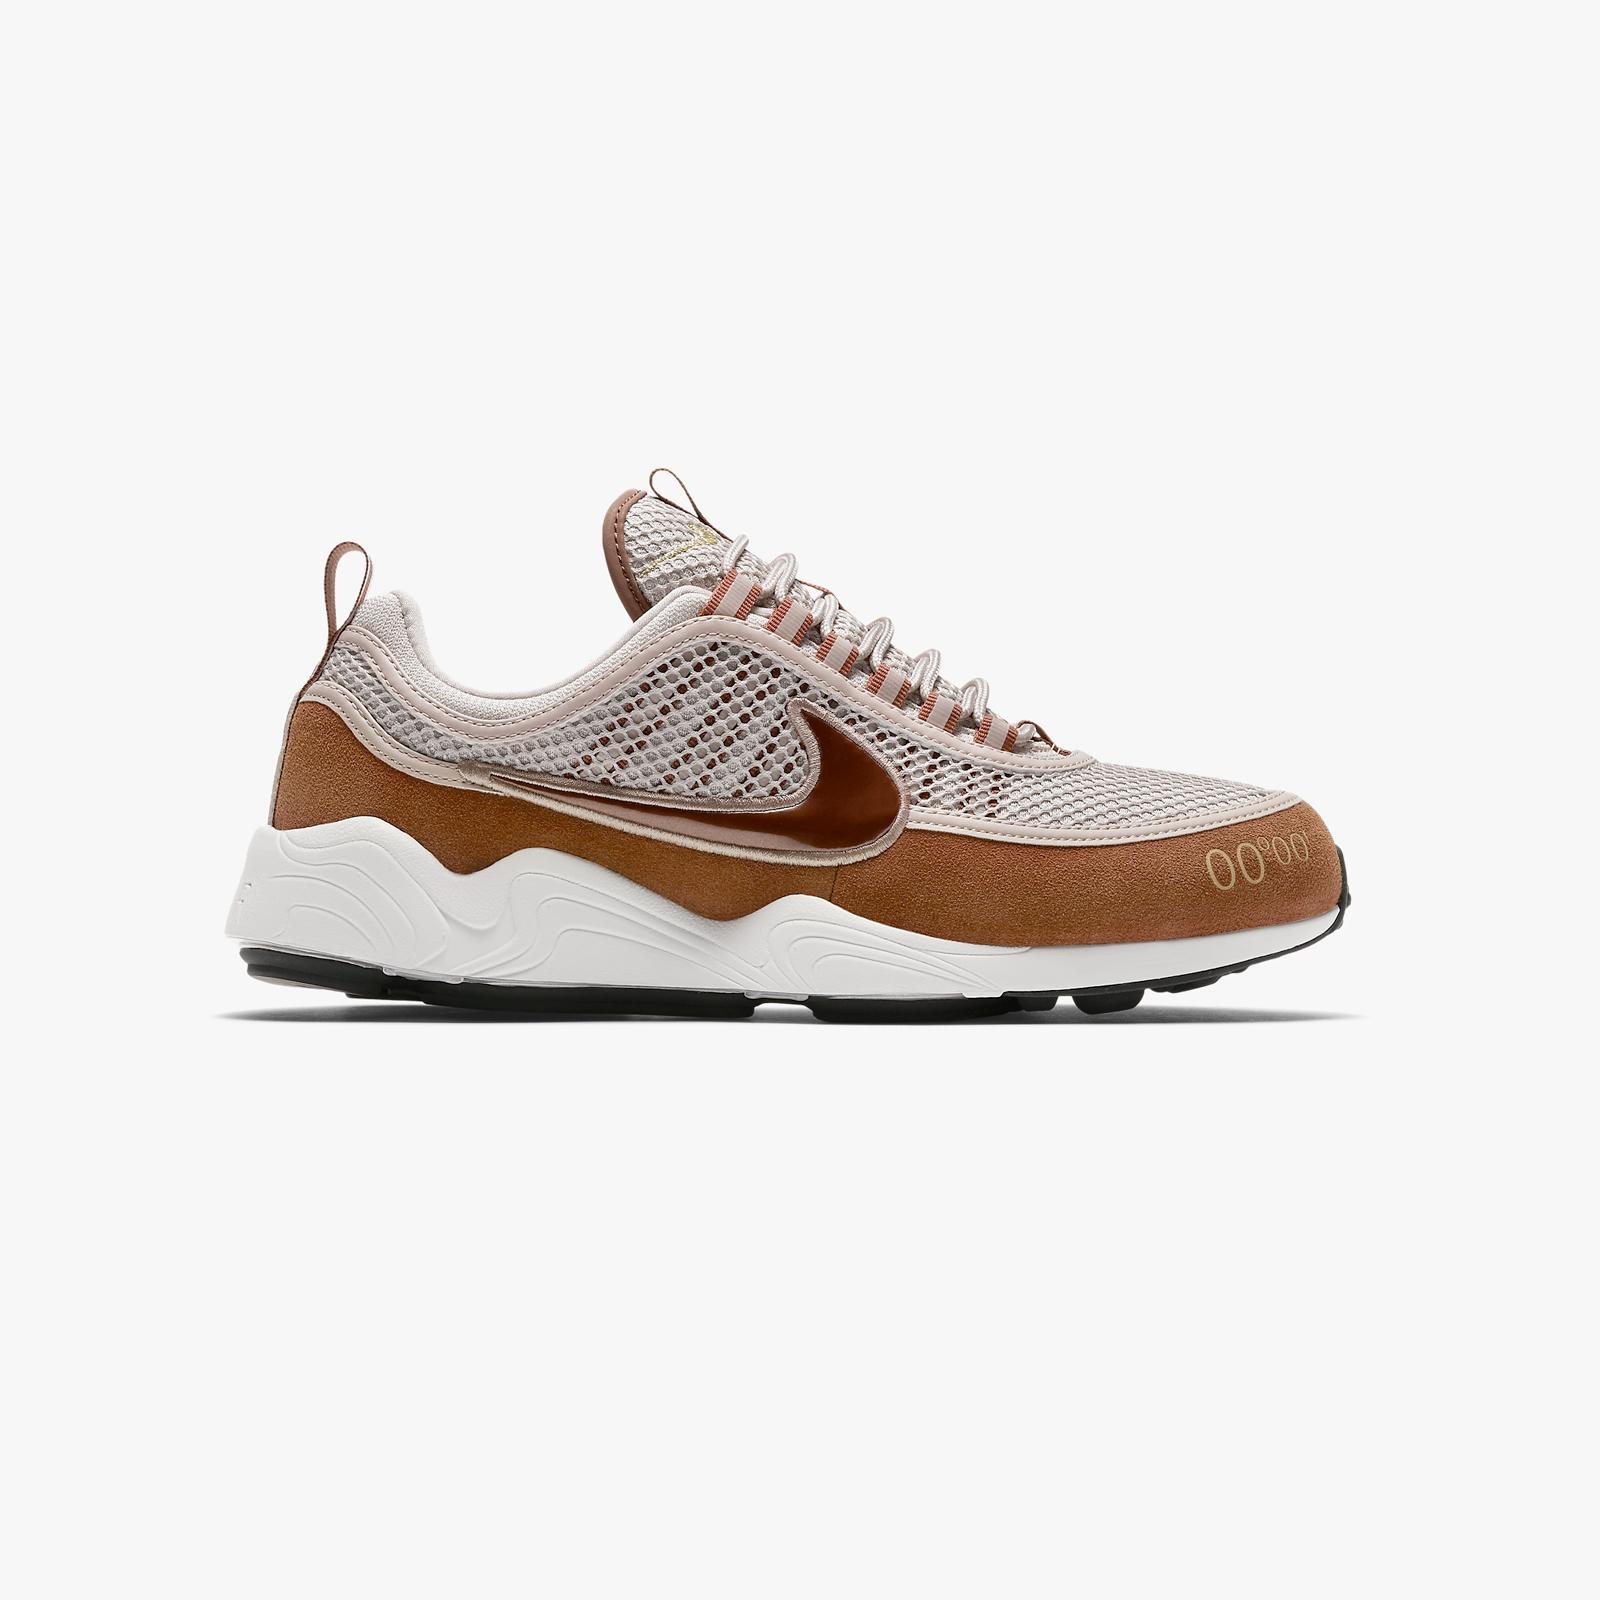 65cbb47400ad18 Nike Air Zoom Spiridon UK - Aj6300-200 - Sneakersnstuff